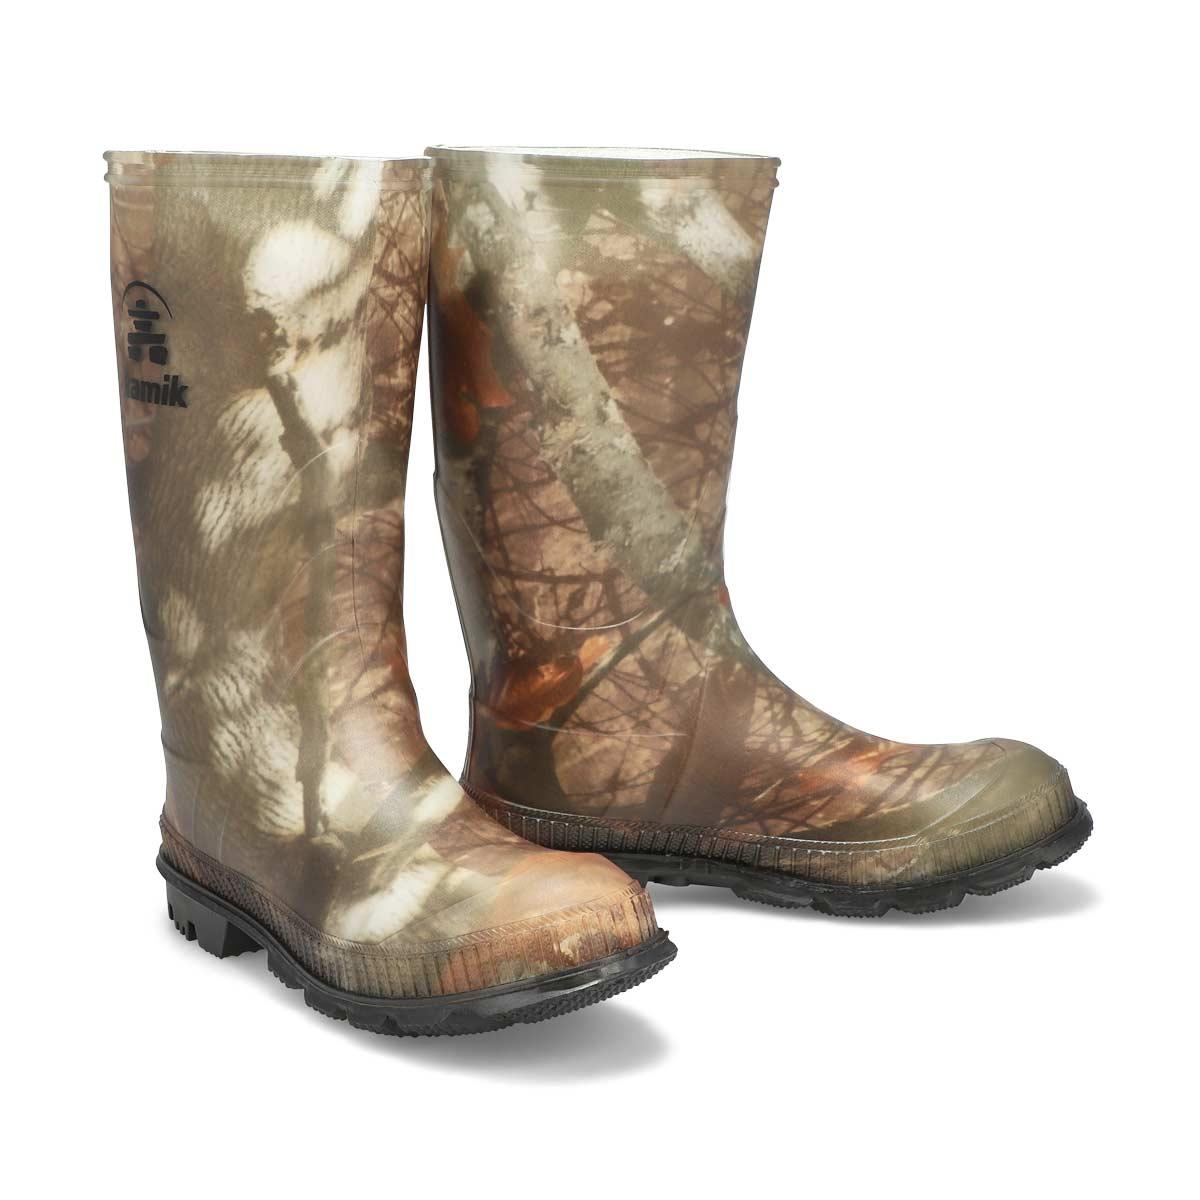 Boys' Stomp Waterproof Rain Boot - Camo